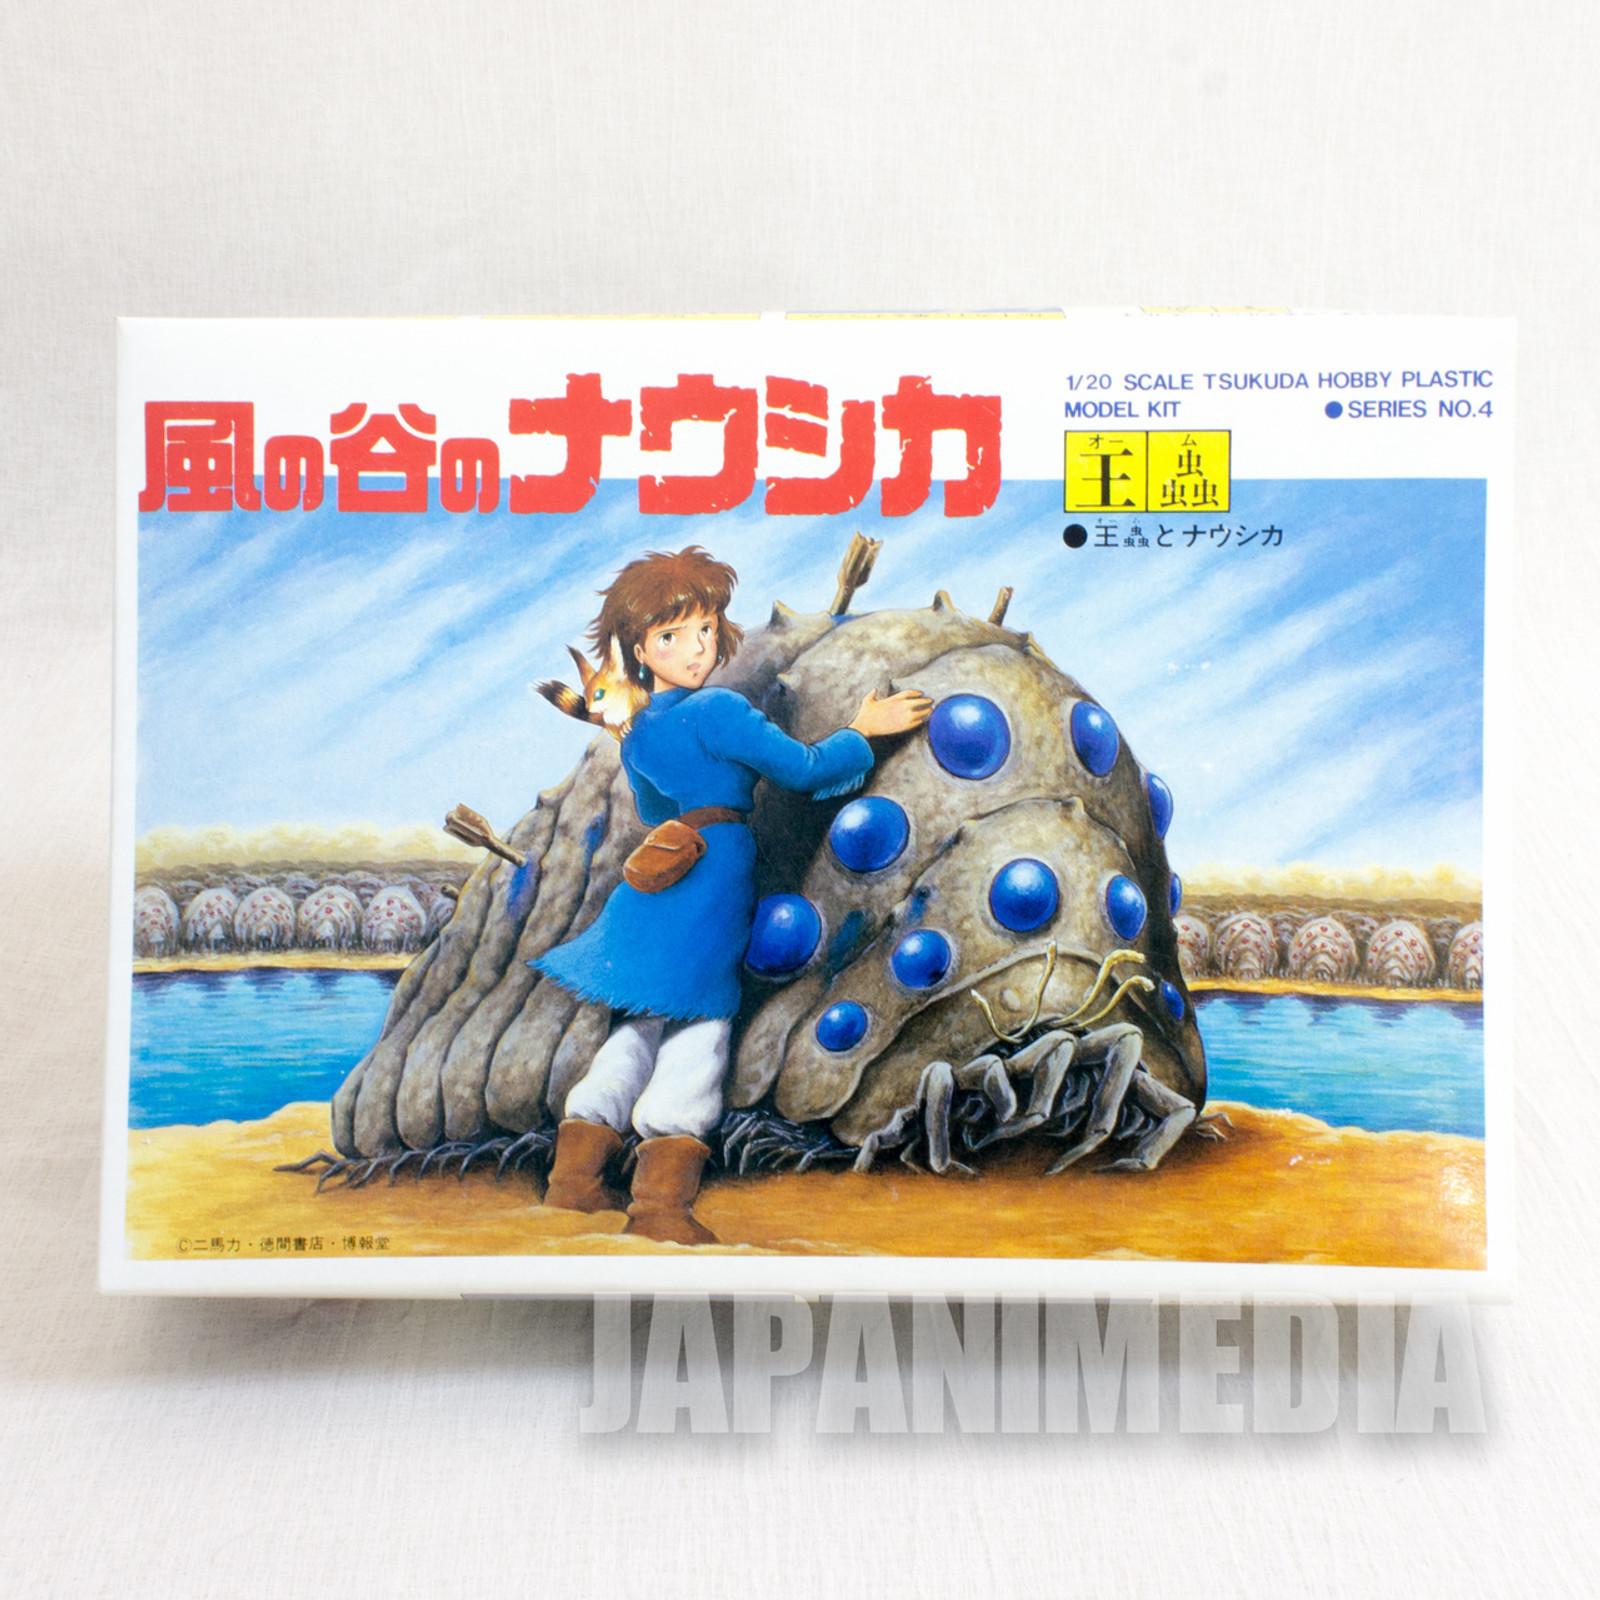 Nausicaa of Valley of Wind OHM Plastic Model Kit Ghibli Tsukuda Hobby